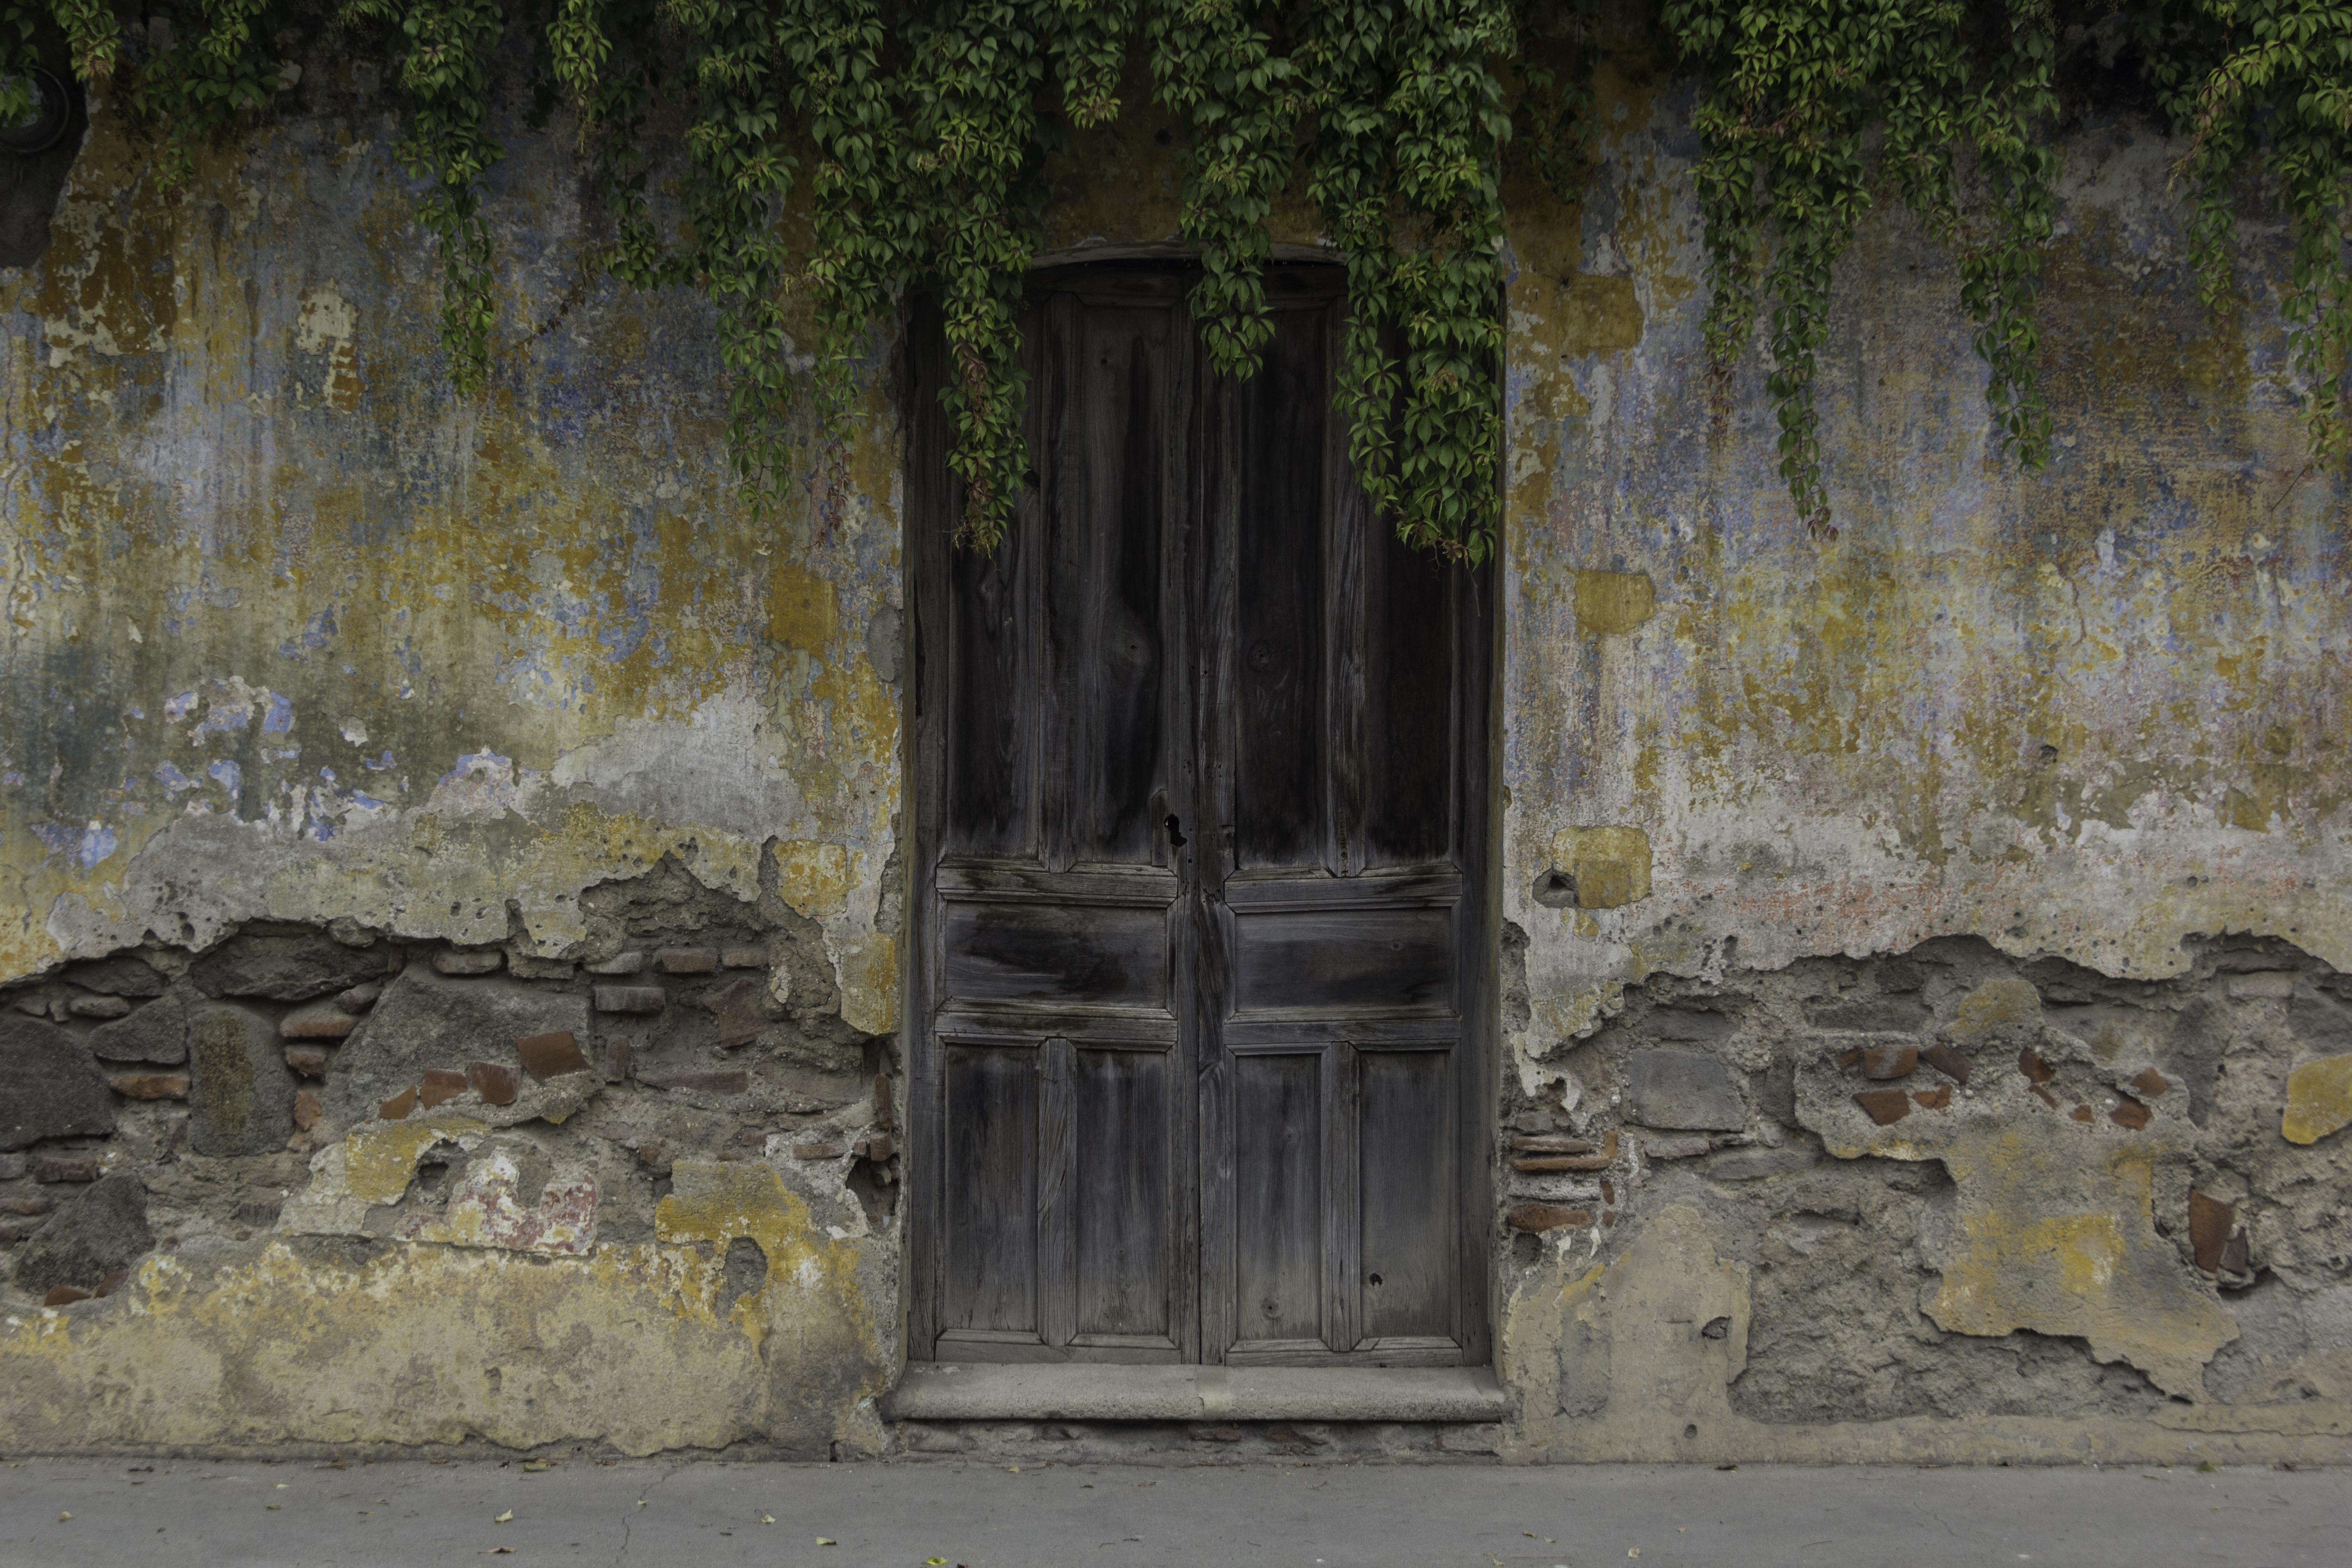 Fotos gratis rock arquitectura madera antiguo pared for Fotos de puertas de madera antiguas